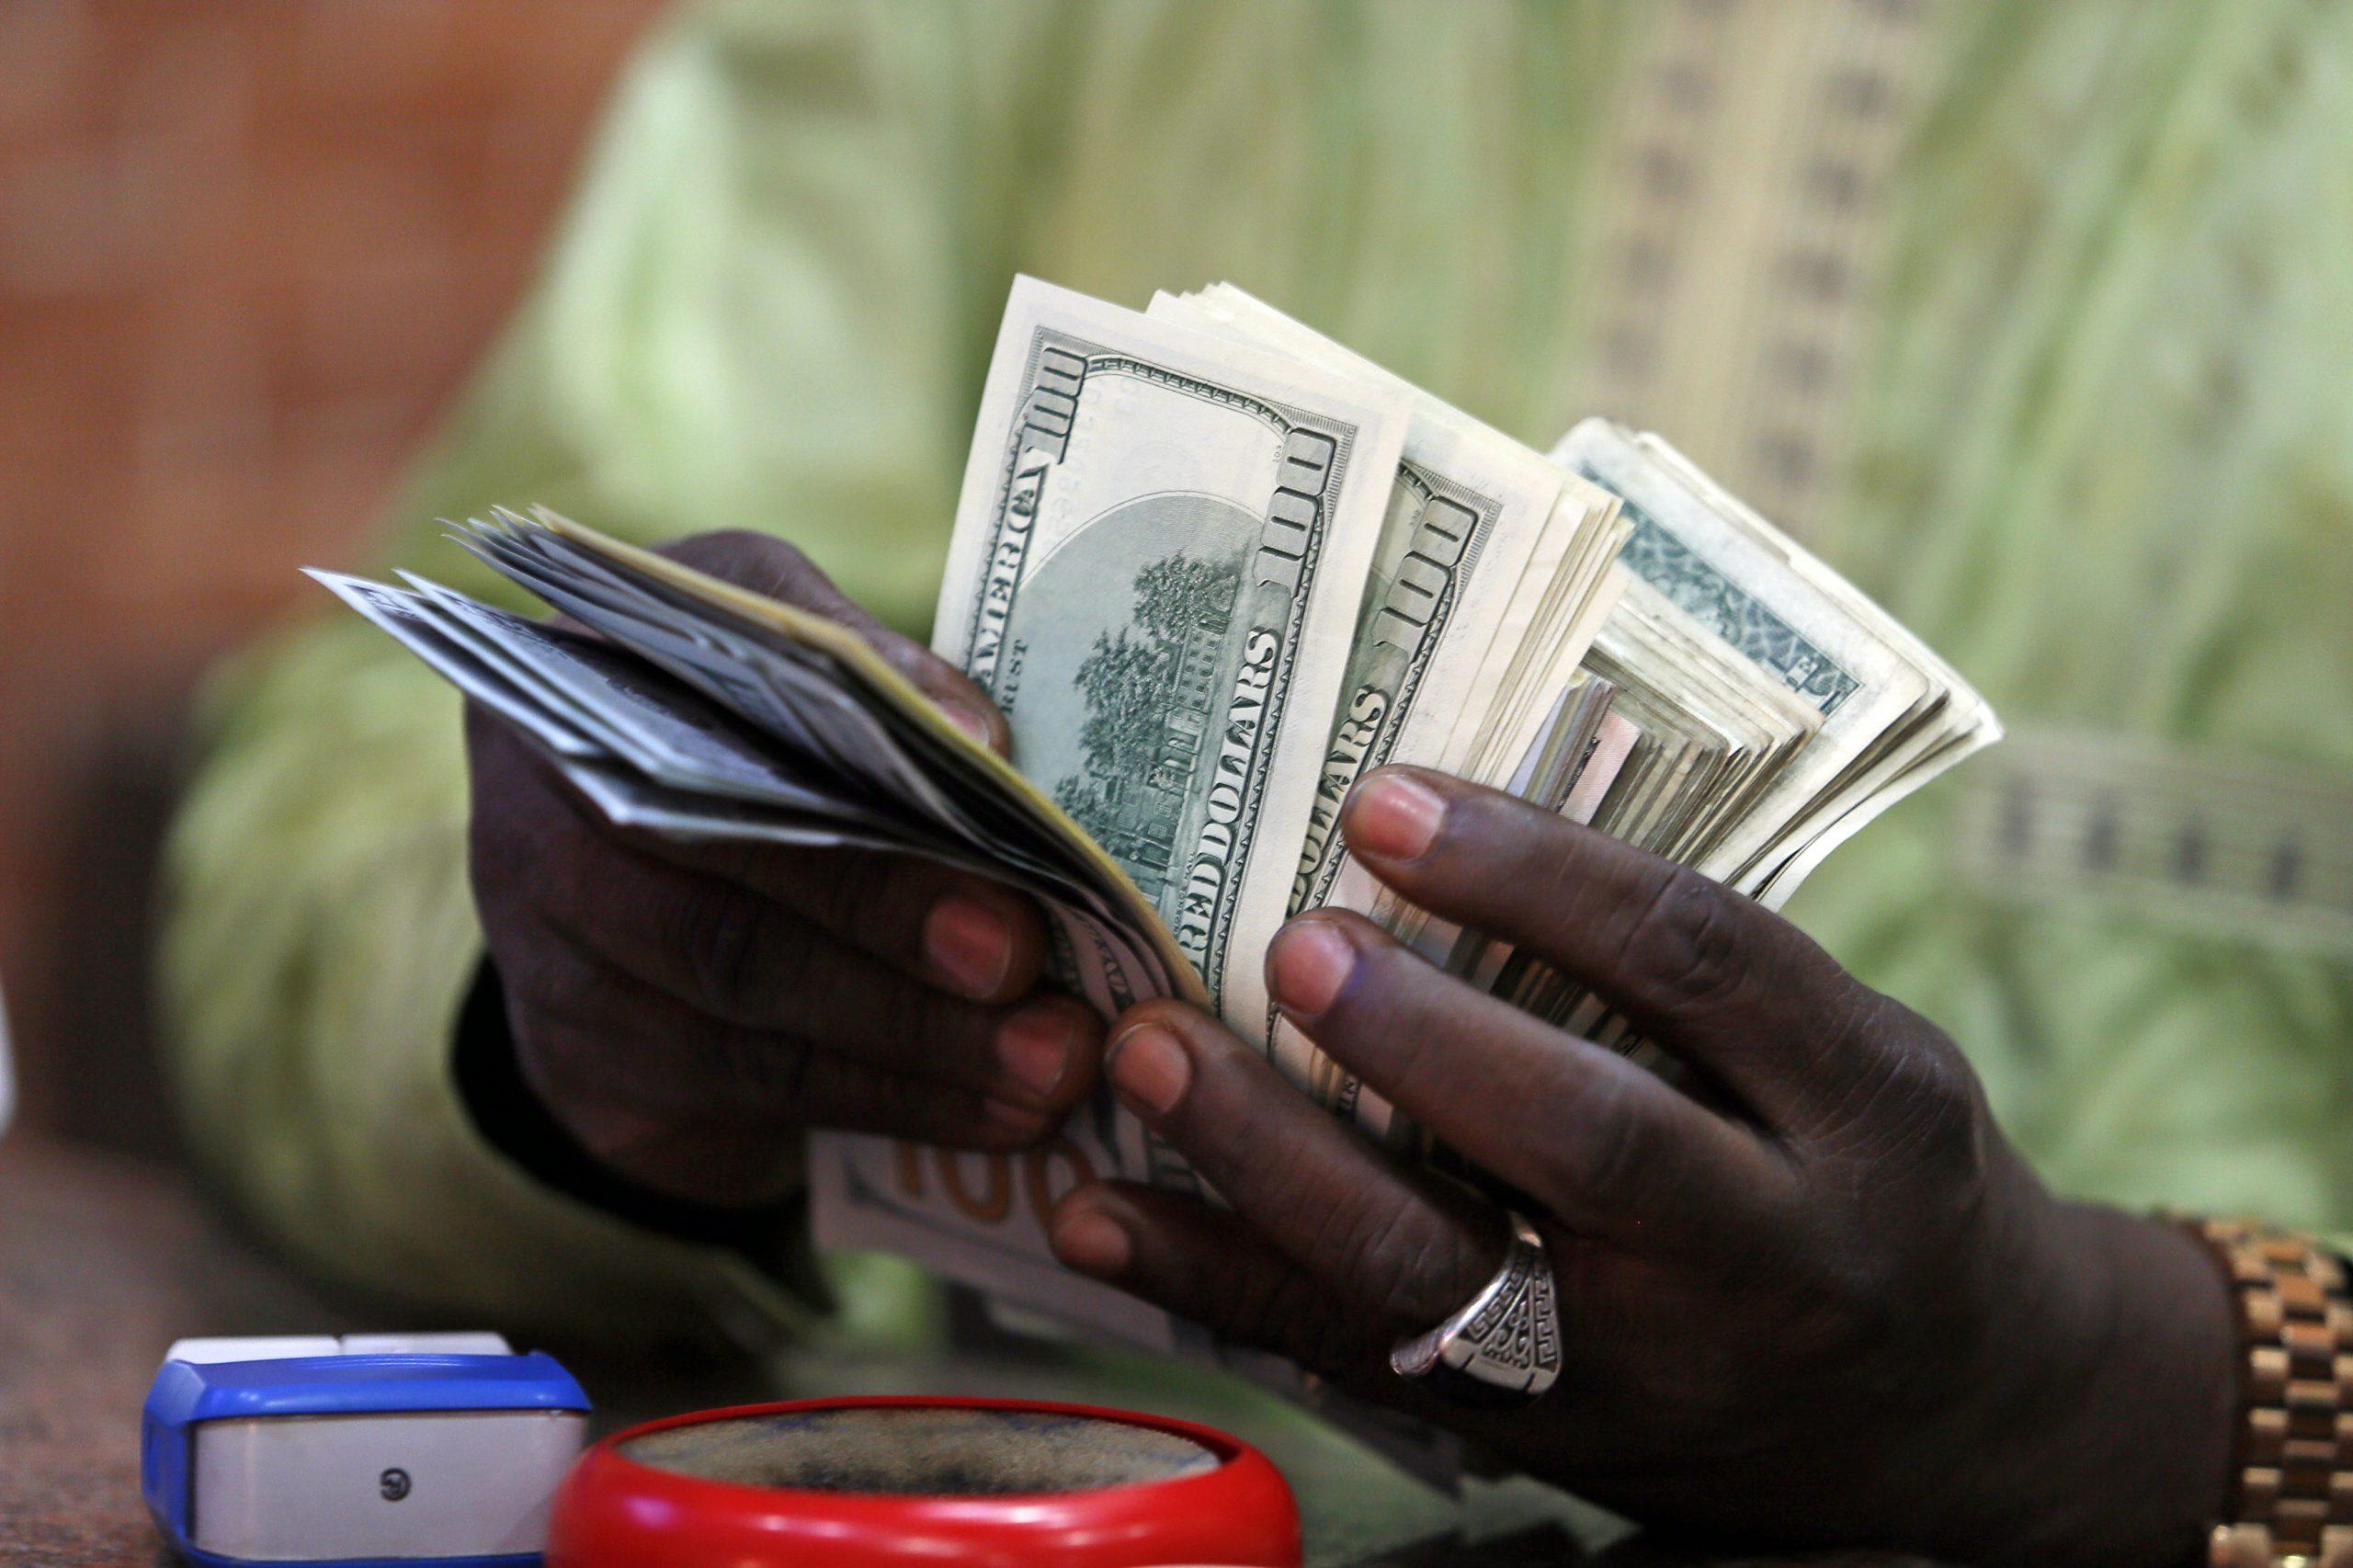 Mengapa tidak ada orang yang membayar pajak di negara berpenghasilan rendah?